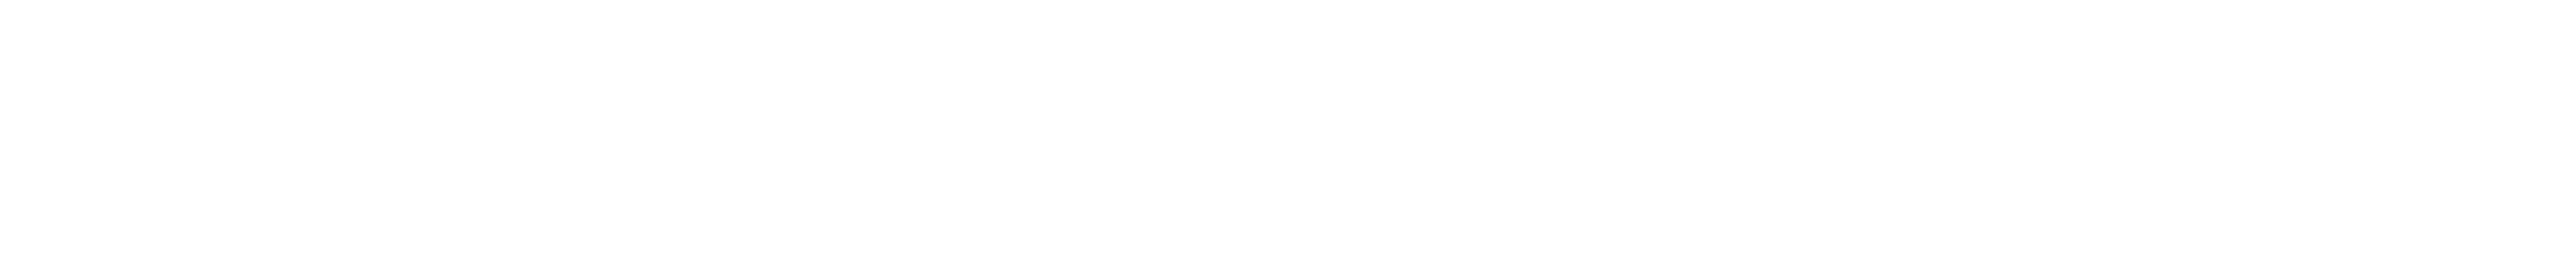 freeshippingbanner-may2021-01.png